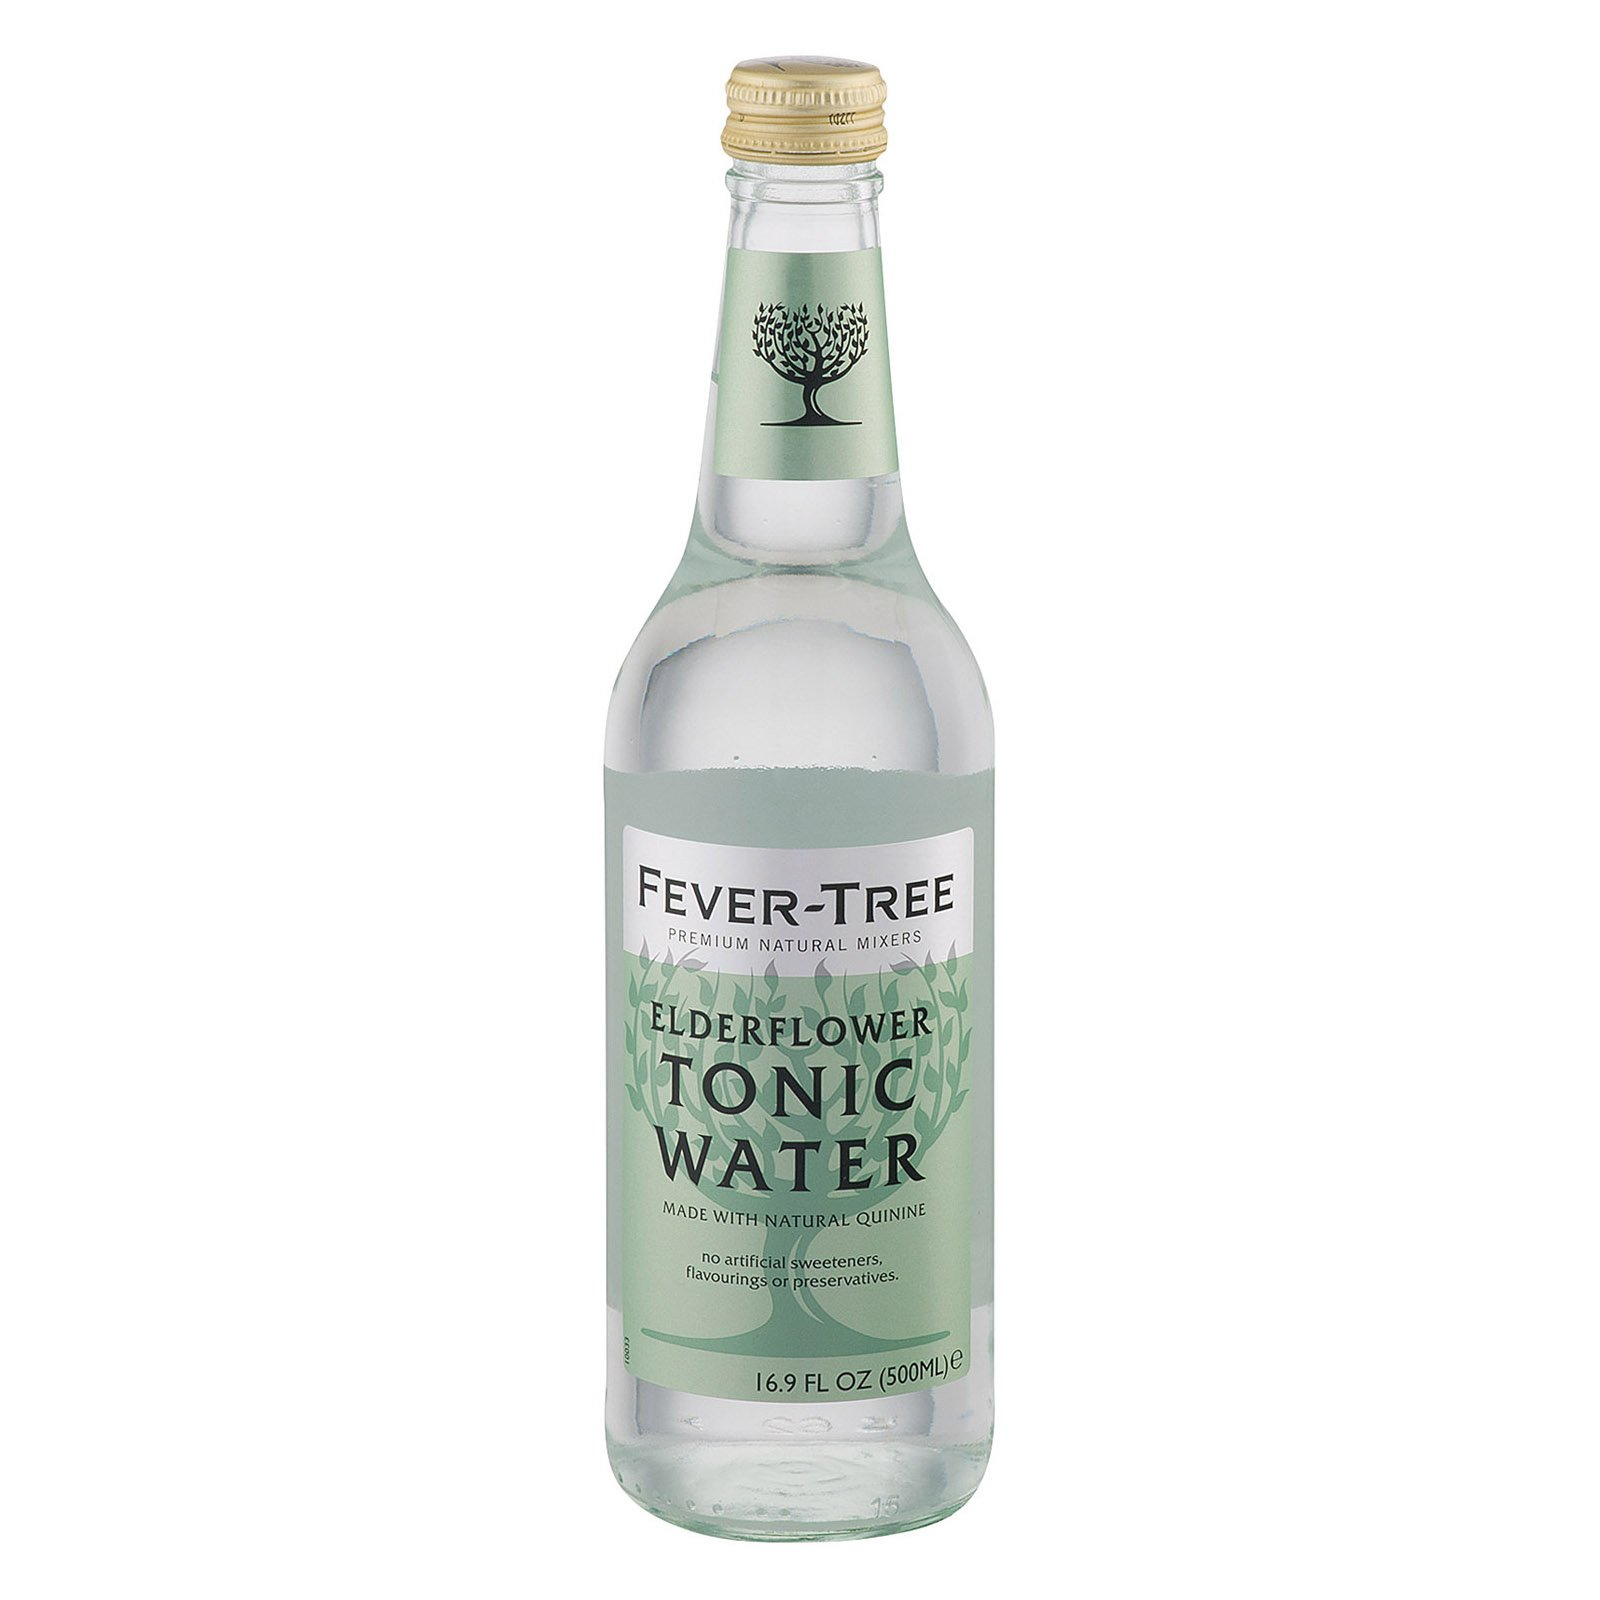 Fever Tree Water Tonic Elderflower